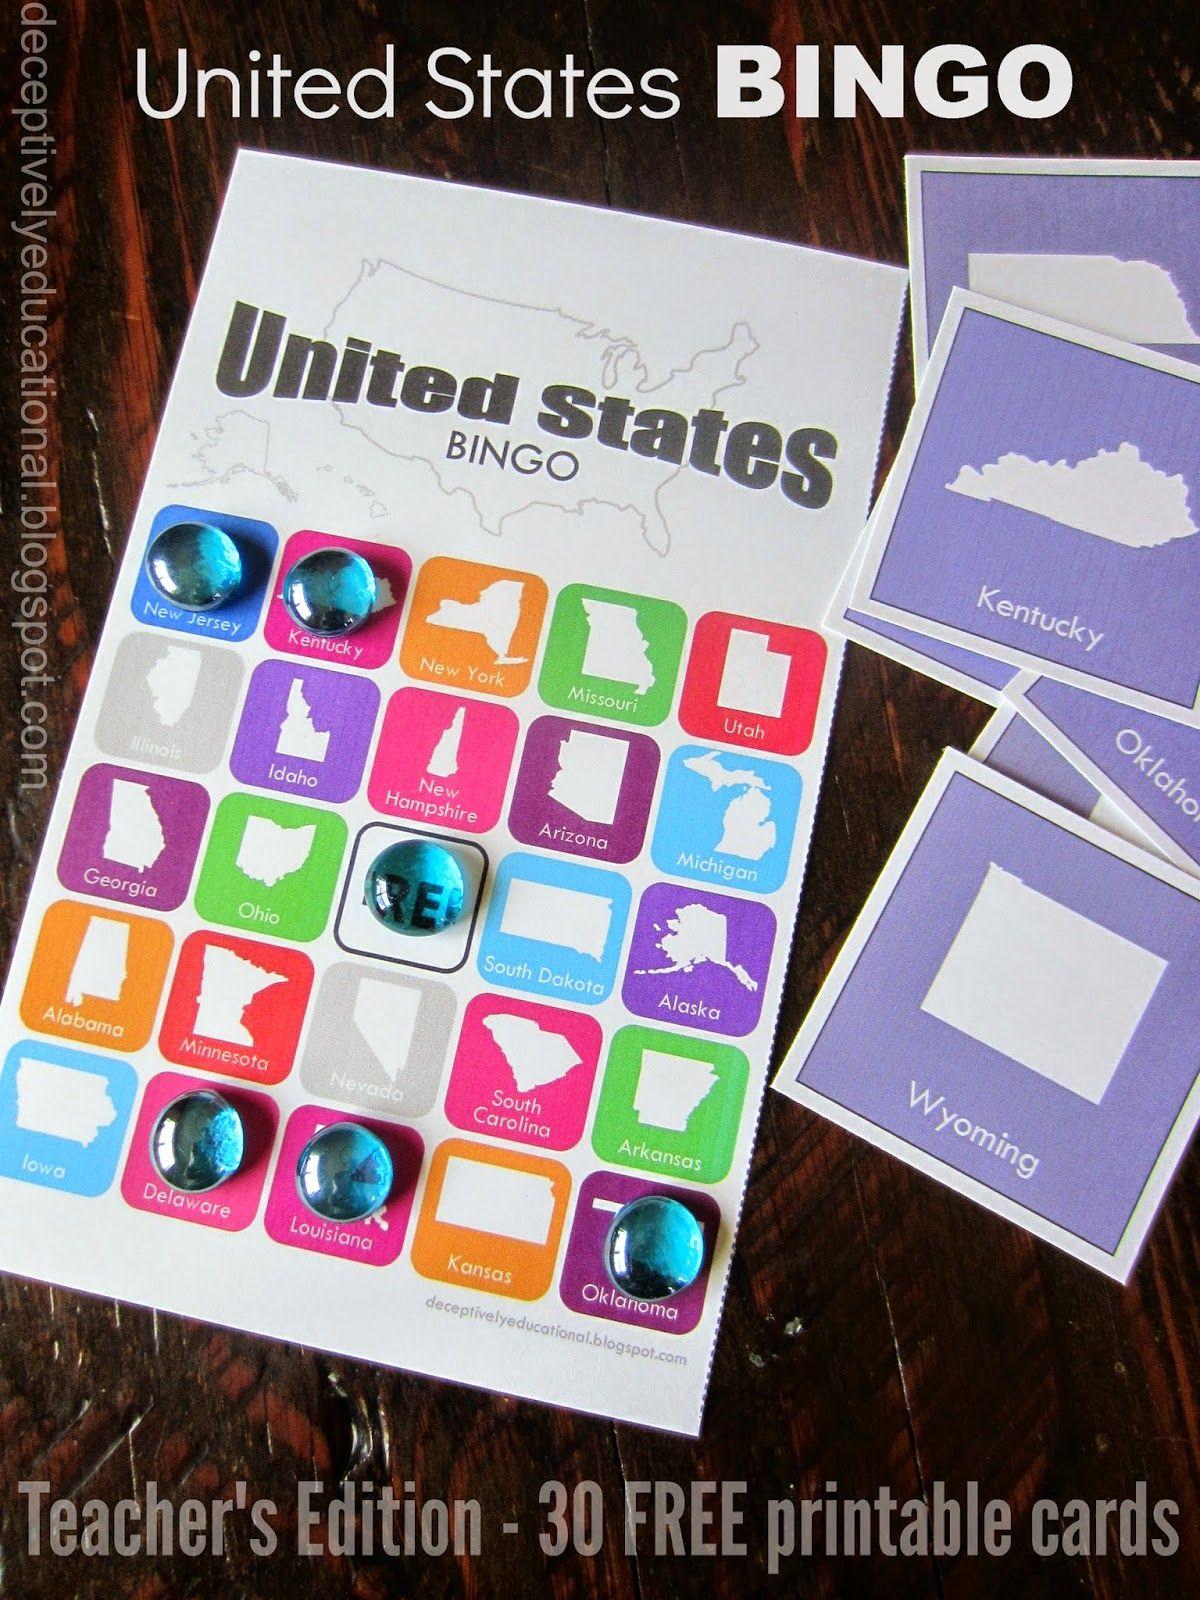 Relentlessly Fun Deceptively Educational United States Bingo